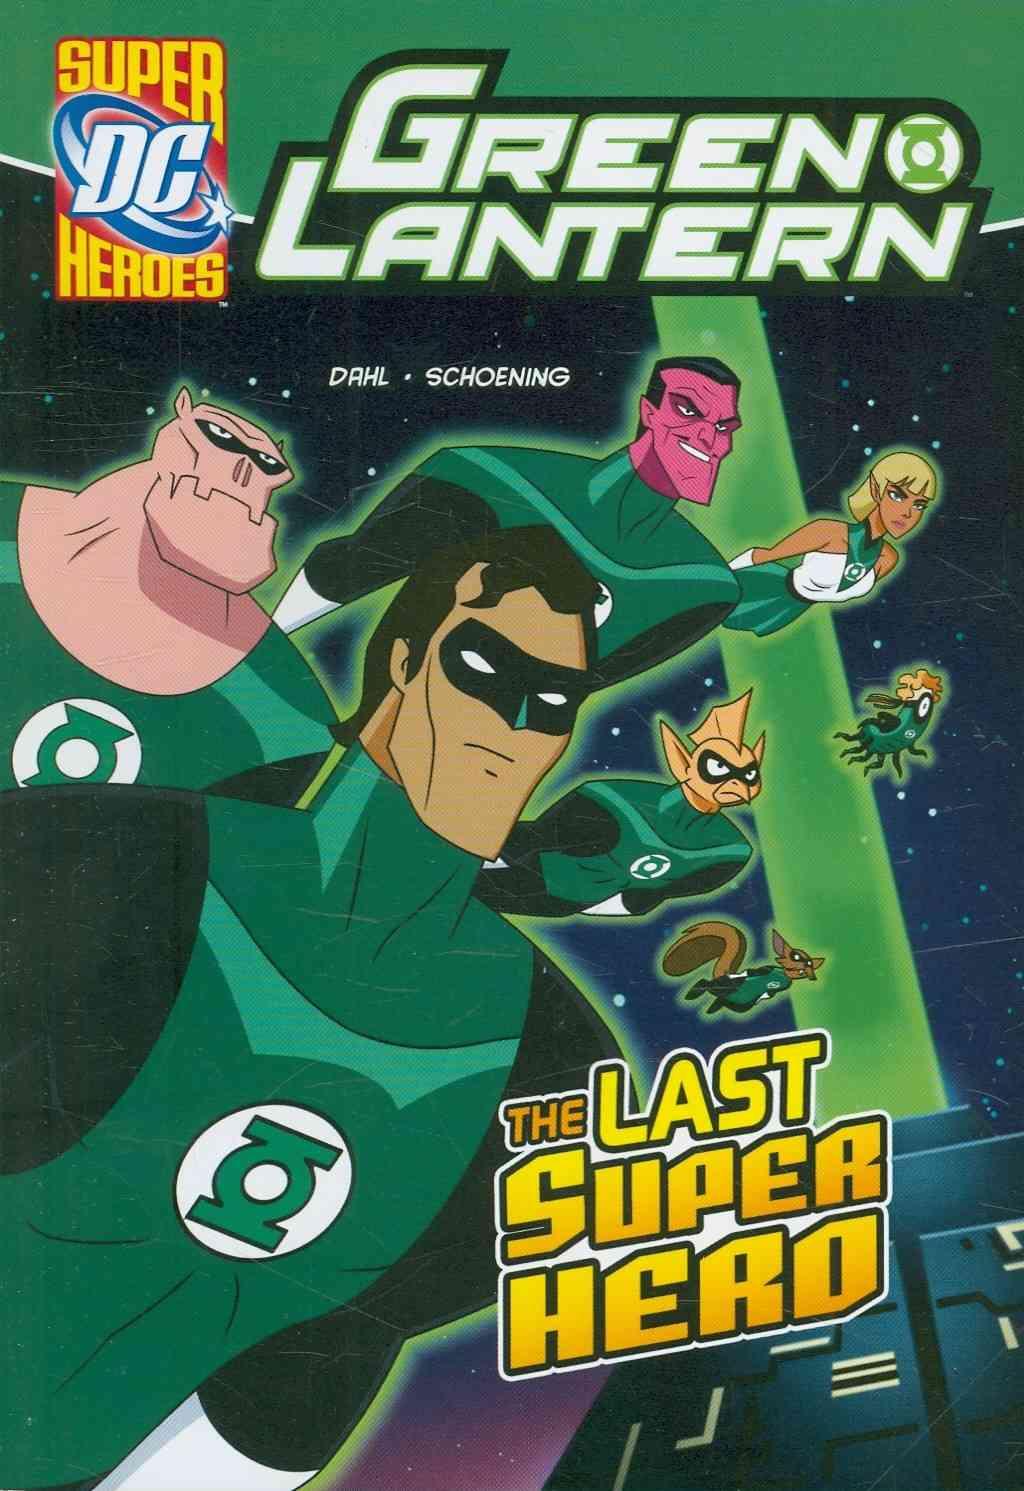 The Last Super Hero (Paperback)